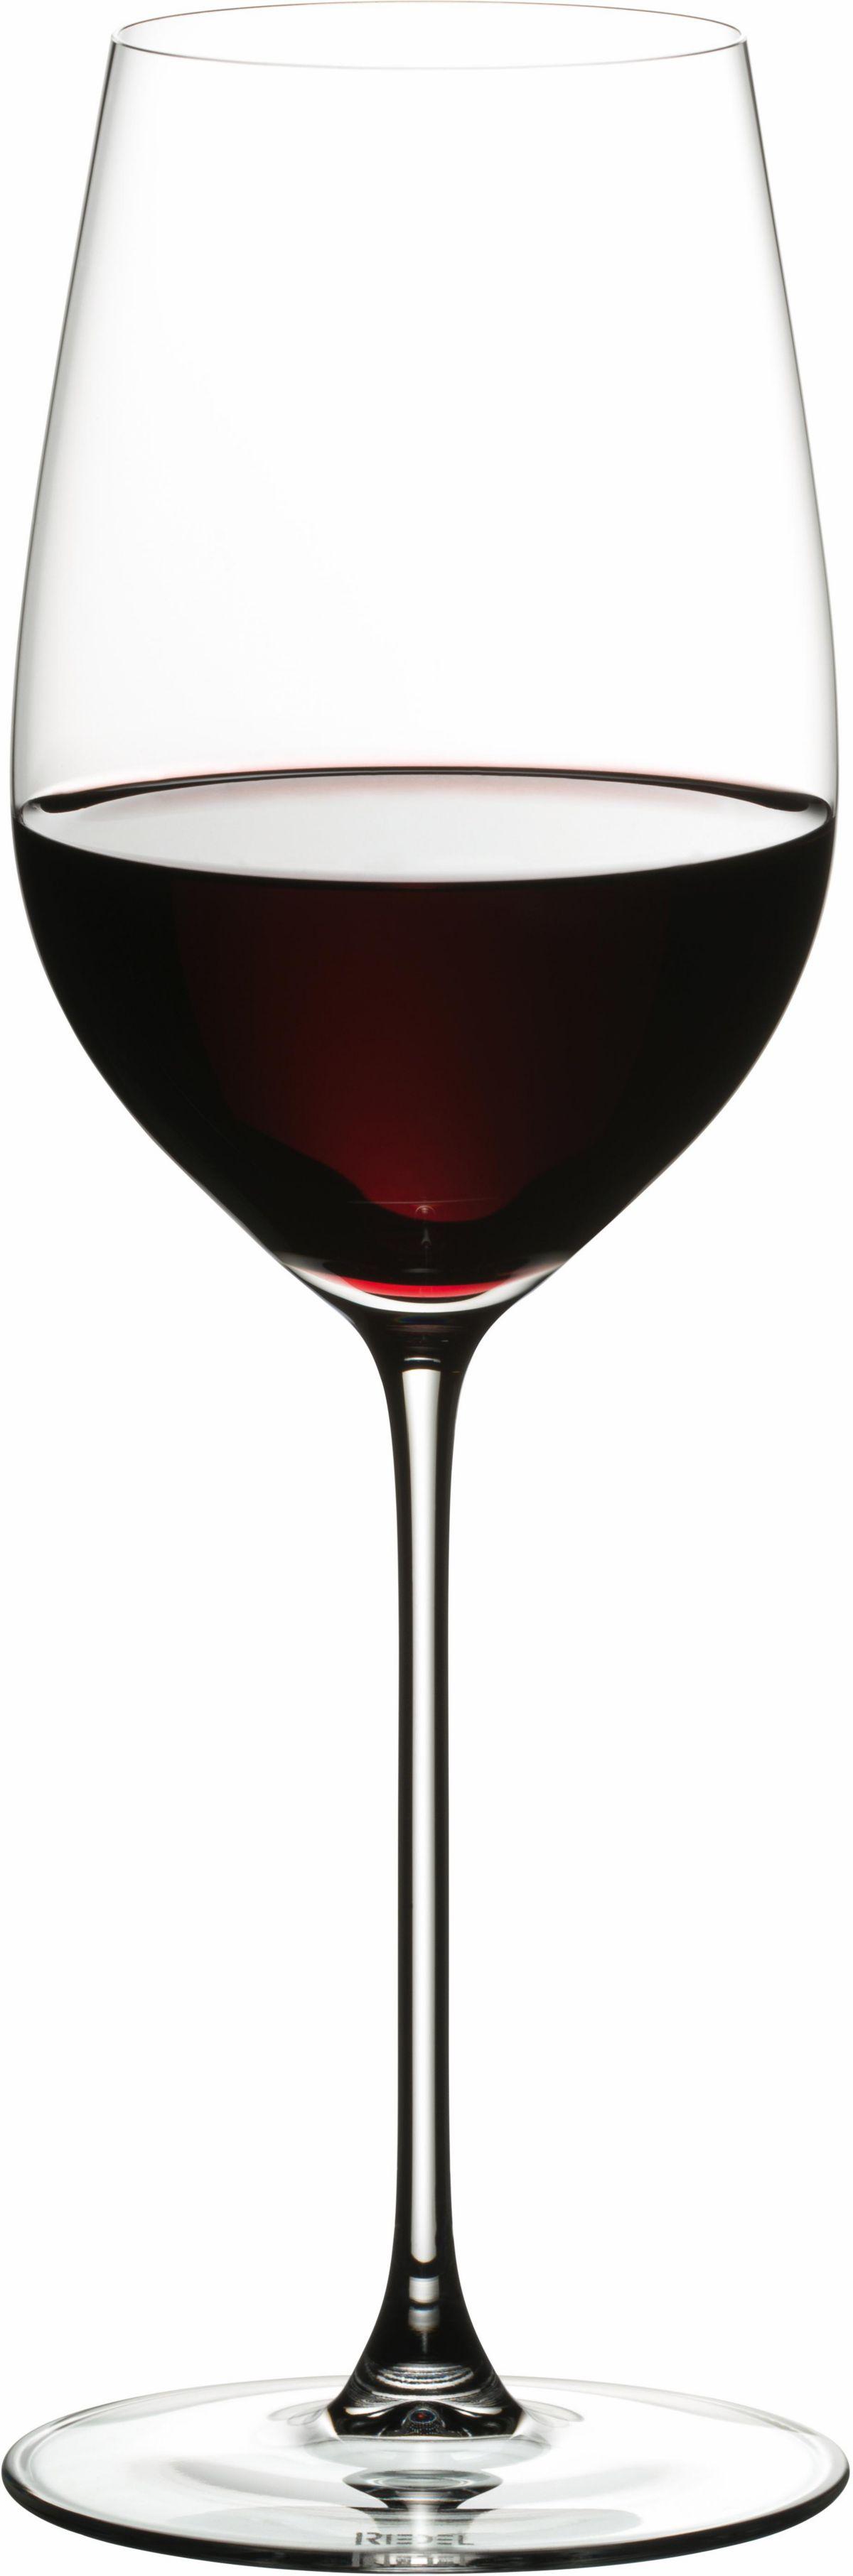 RIEDEL GLASS Wein-Glas, Riesling/Zinfandel, 2er...